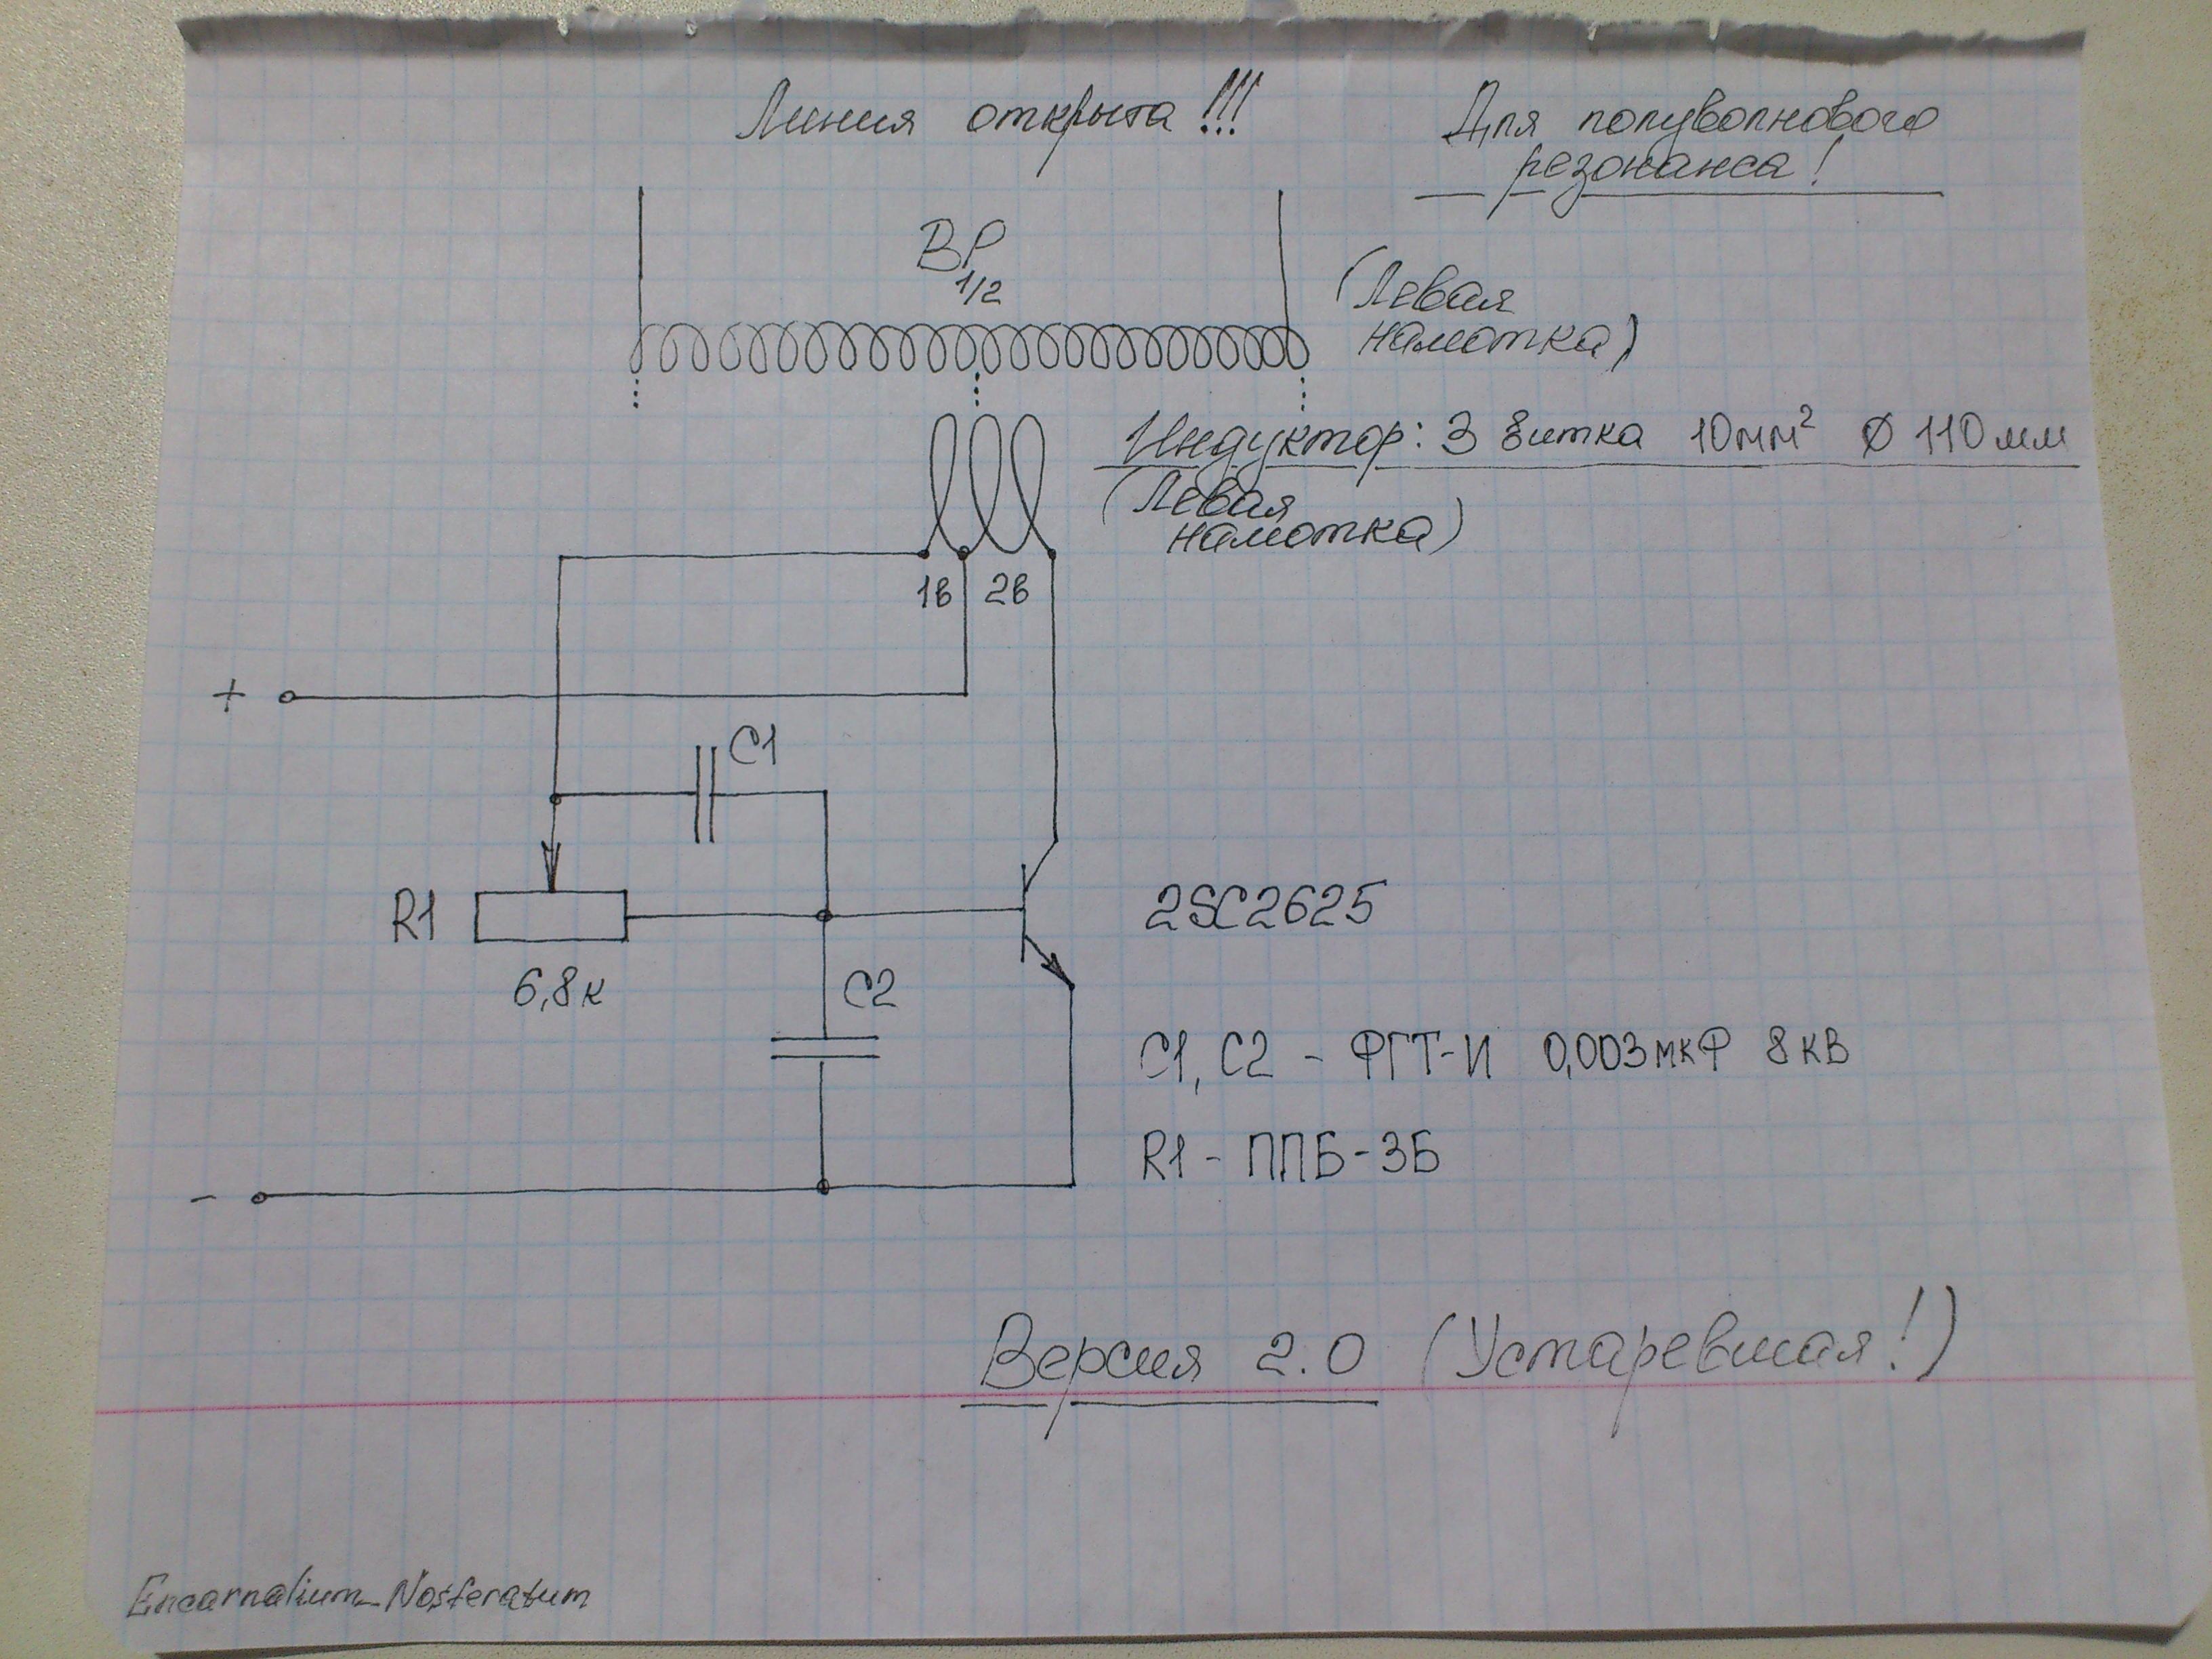 Version20-2.jpg